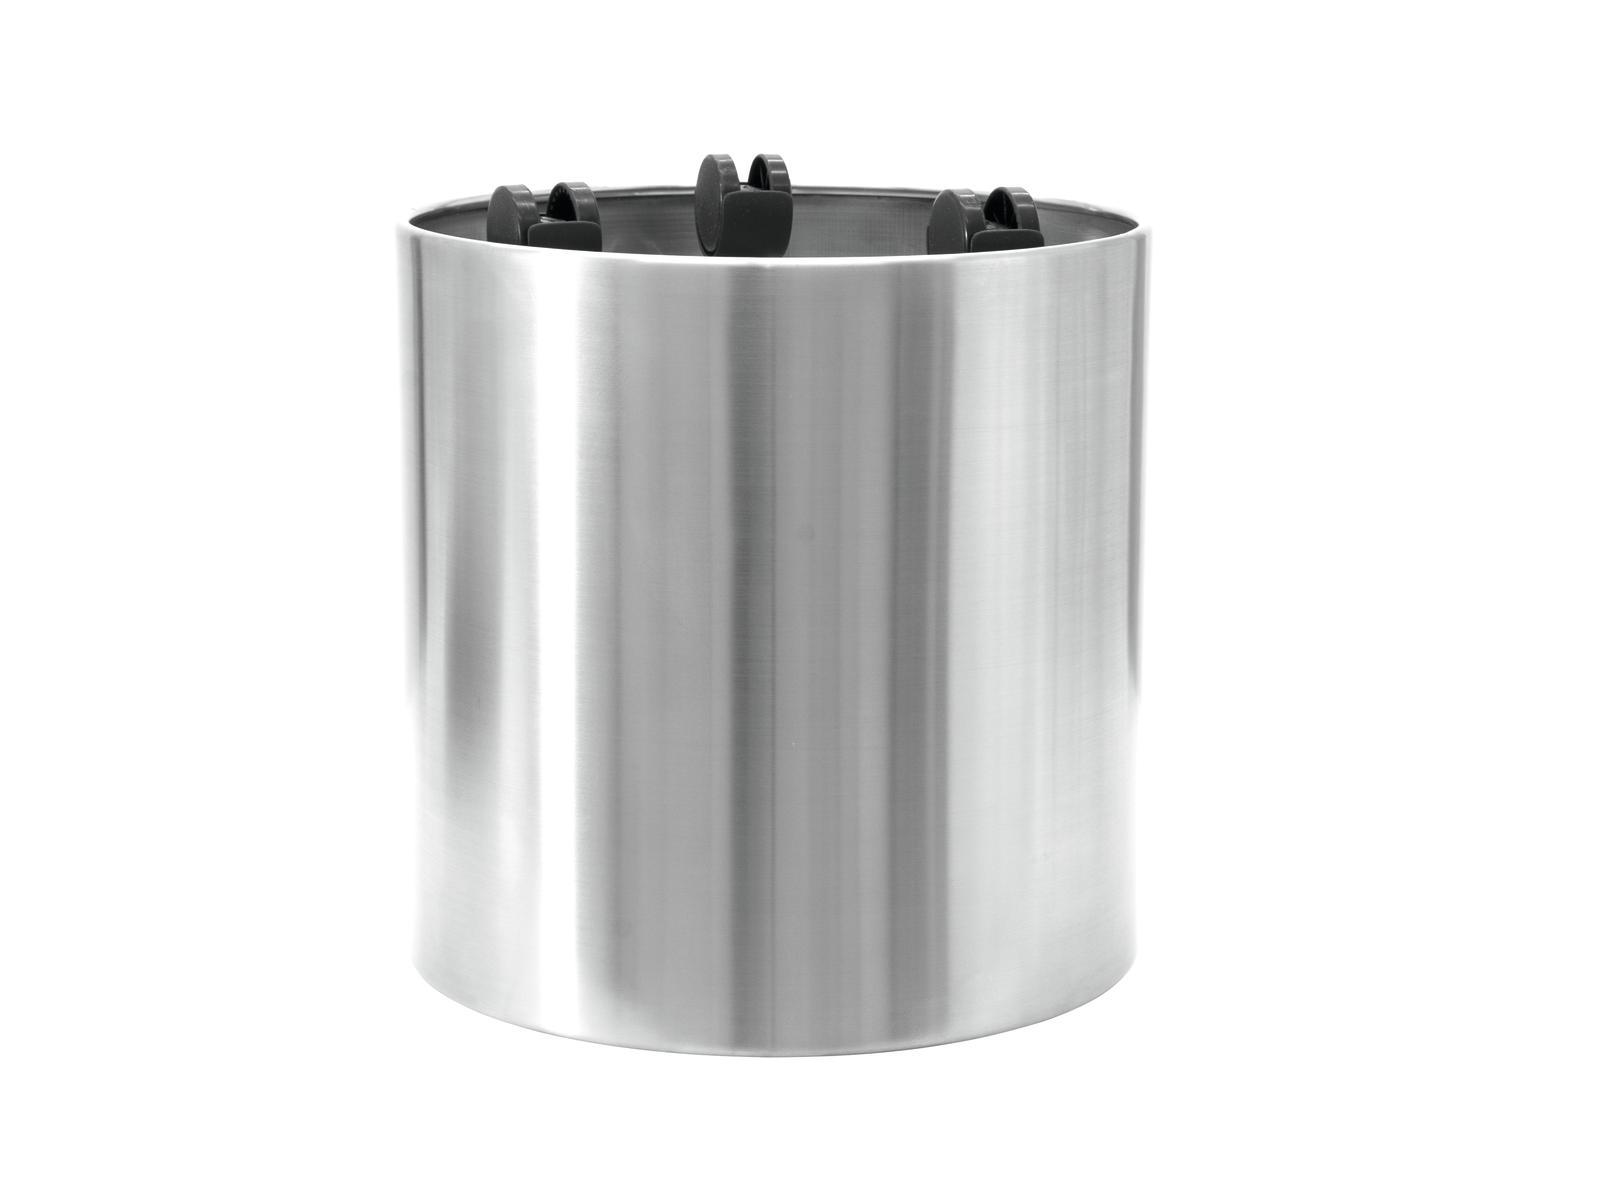 EUROPALMS STEELECHT-40, in acciaio inox pentola, Ø40cm